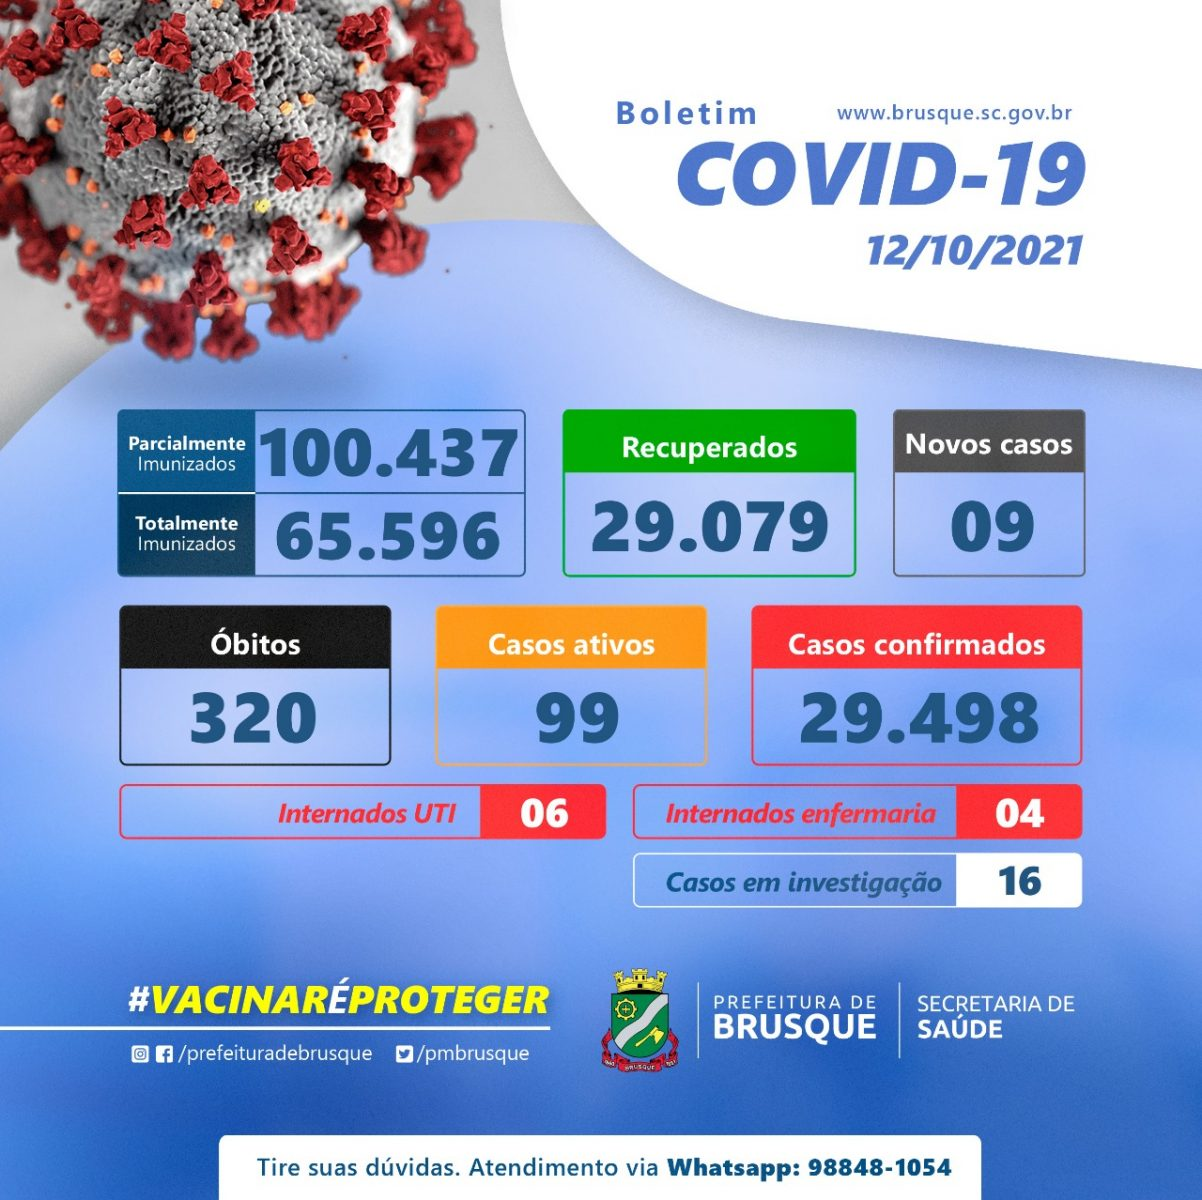 Covid-19: Confira o boletim epidemiológico desta terça-feira (12)